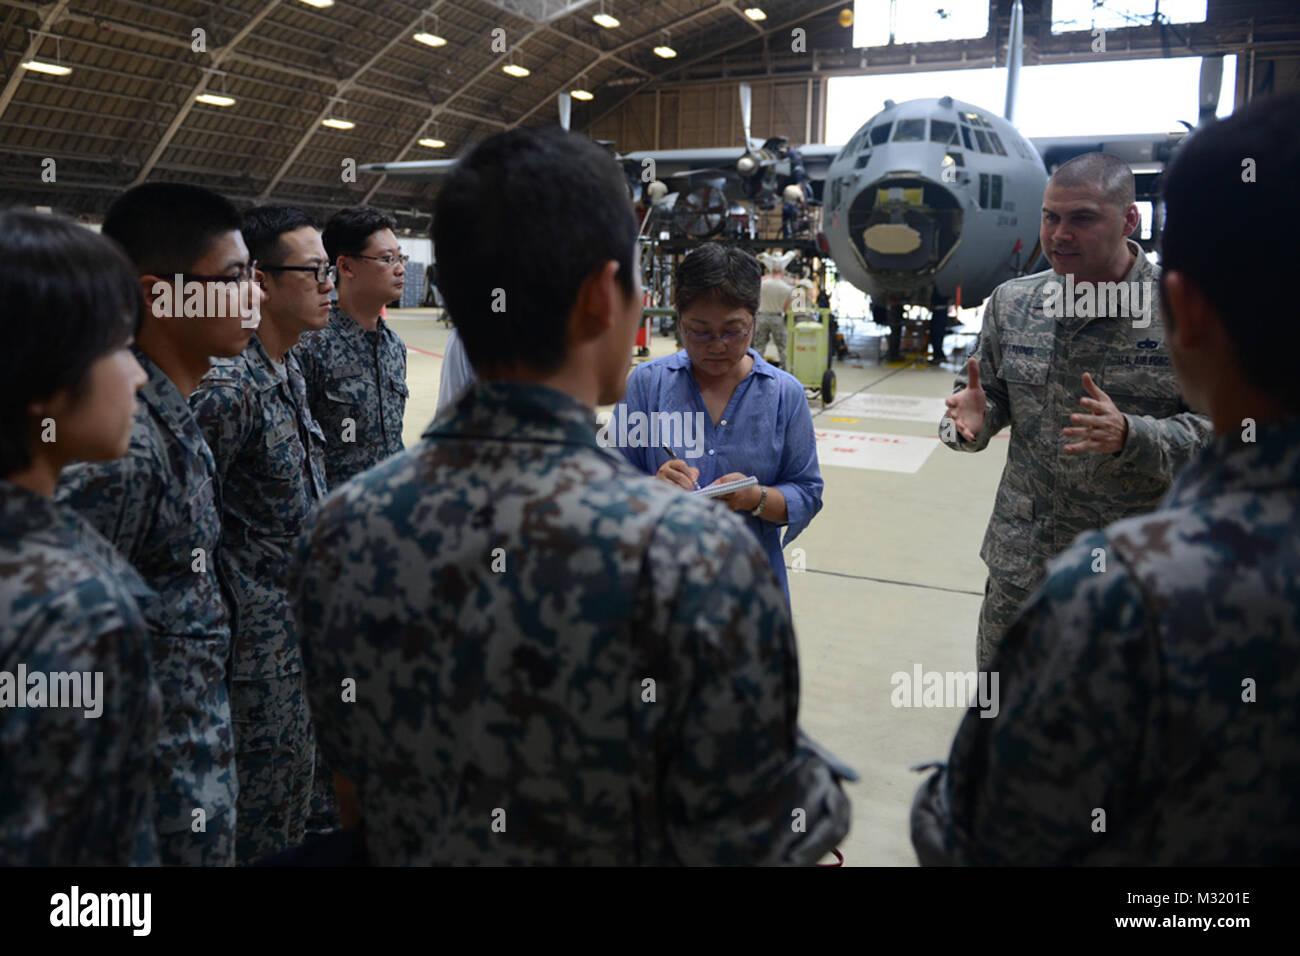 YOKOTA AIR BASE, Japan -- Tech. Sgt. Raul Torres, 374th Maintenance Squadron isochronal dock chief, explains when - Stock Image